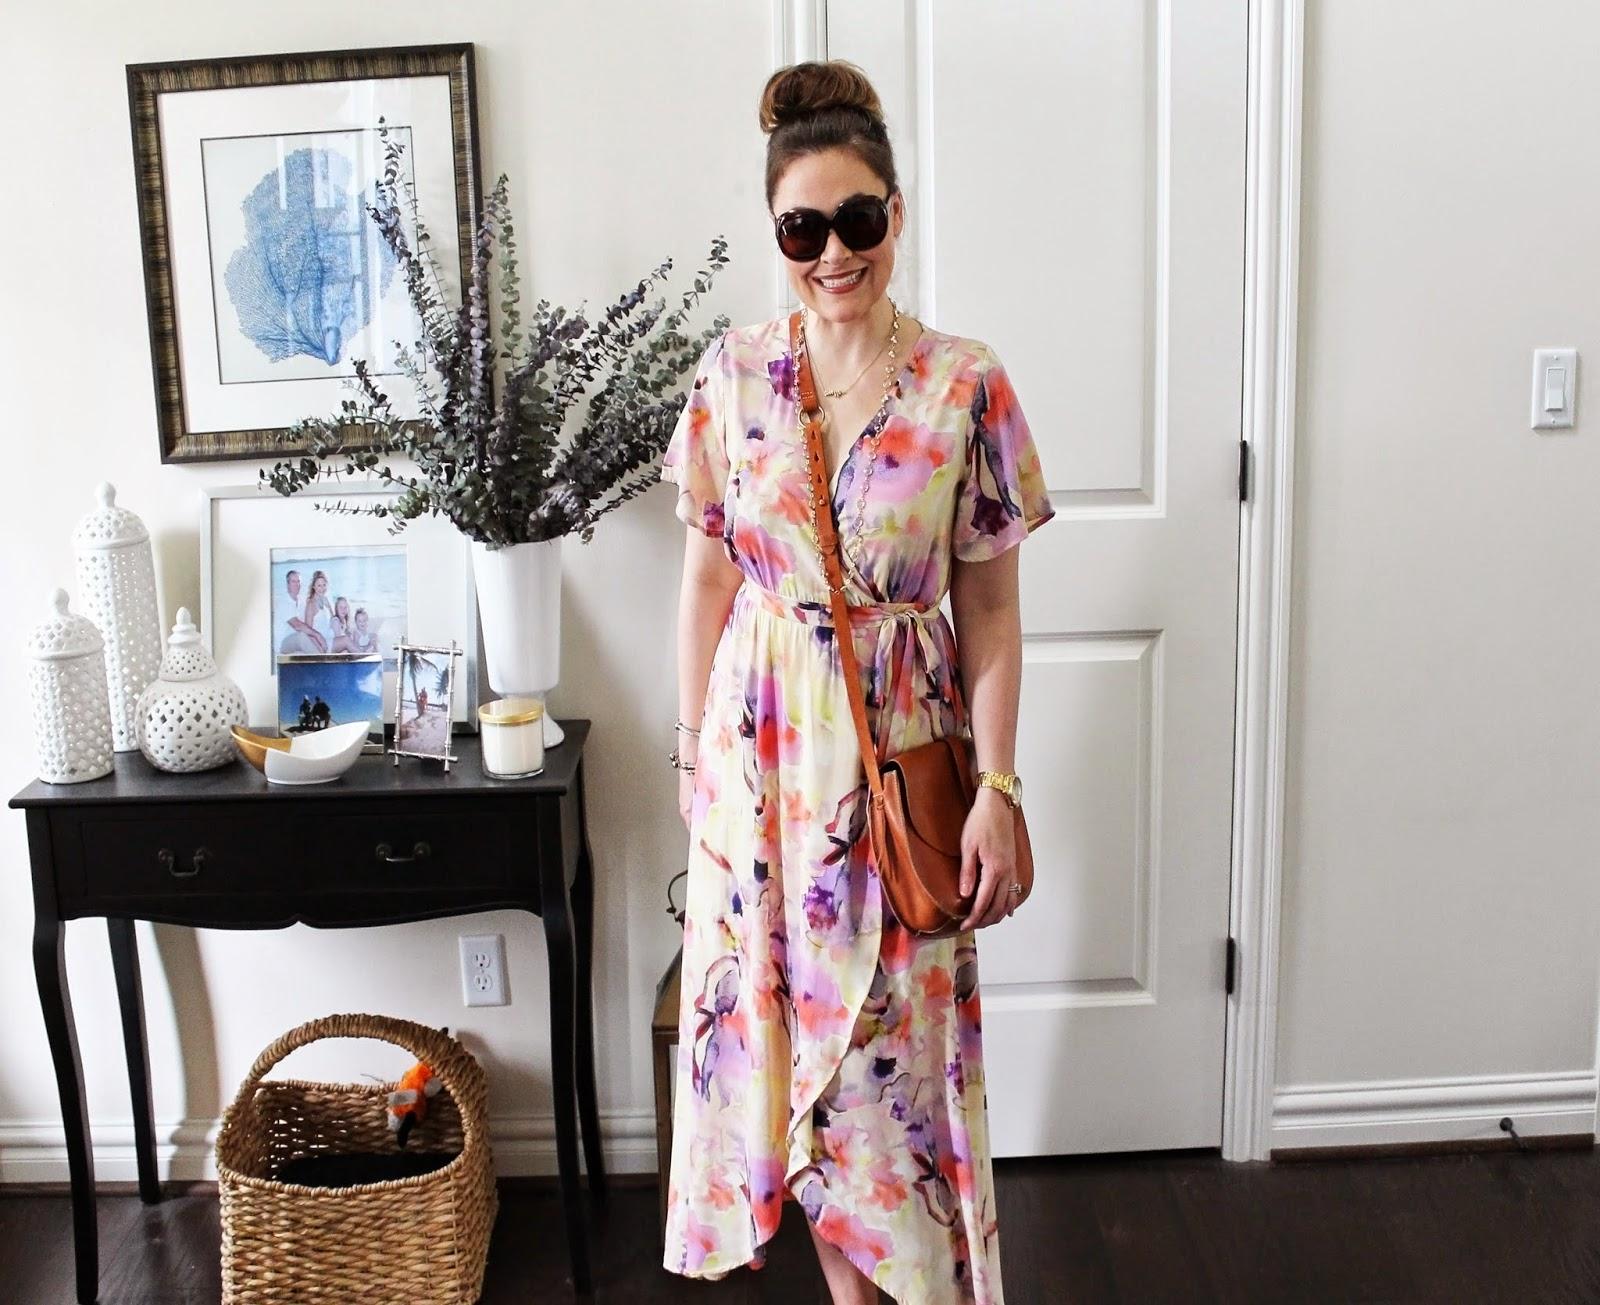 Madewell Crossbody Bag, Tom Ford Bianca Sunglasses, Oversized Sunglasses, Floral Wrap Dress